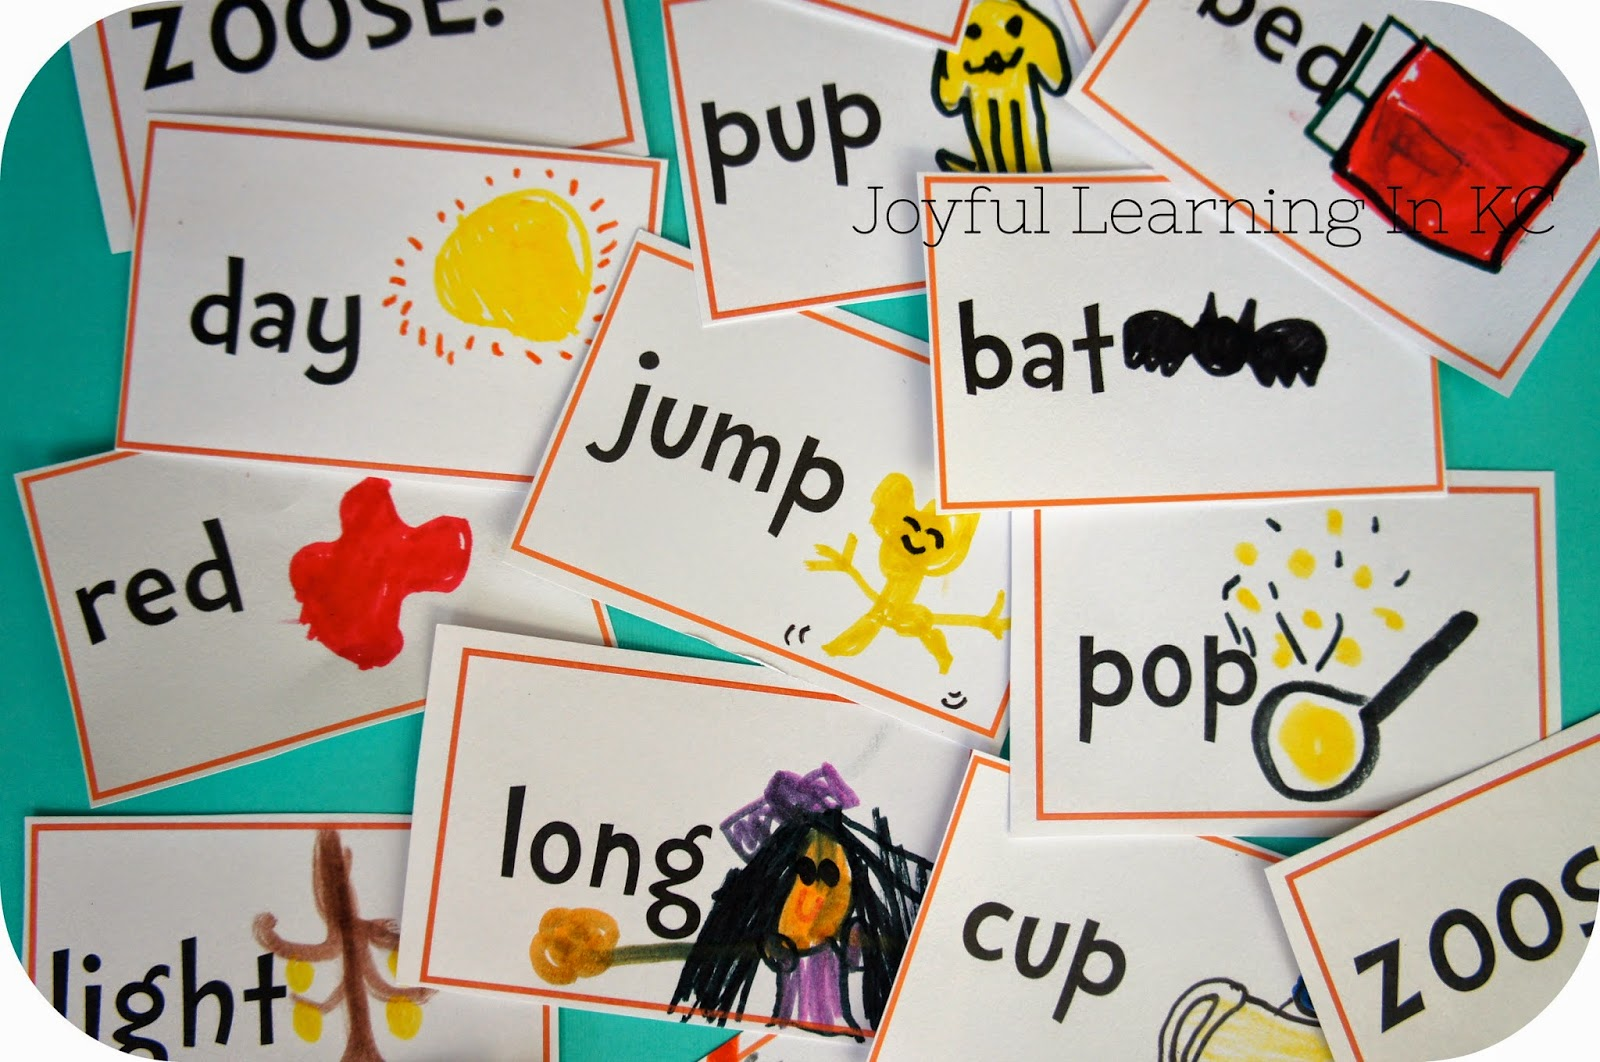 Joyful Learning In Kc Word Family Games For Dr Seuss